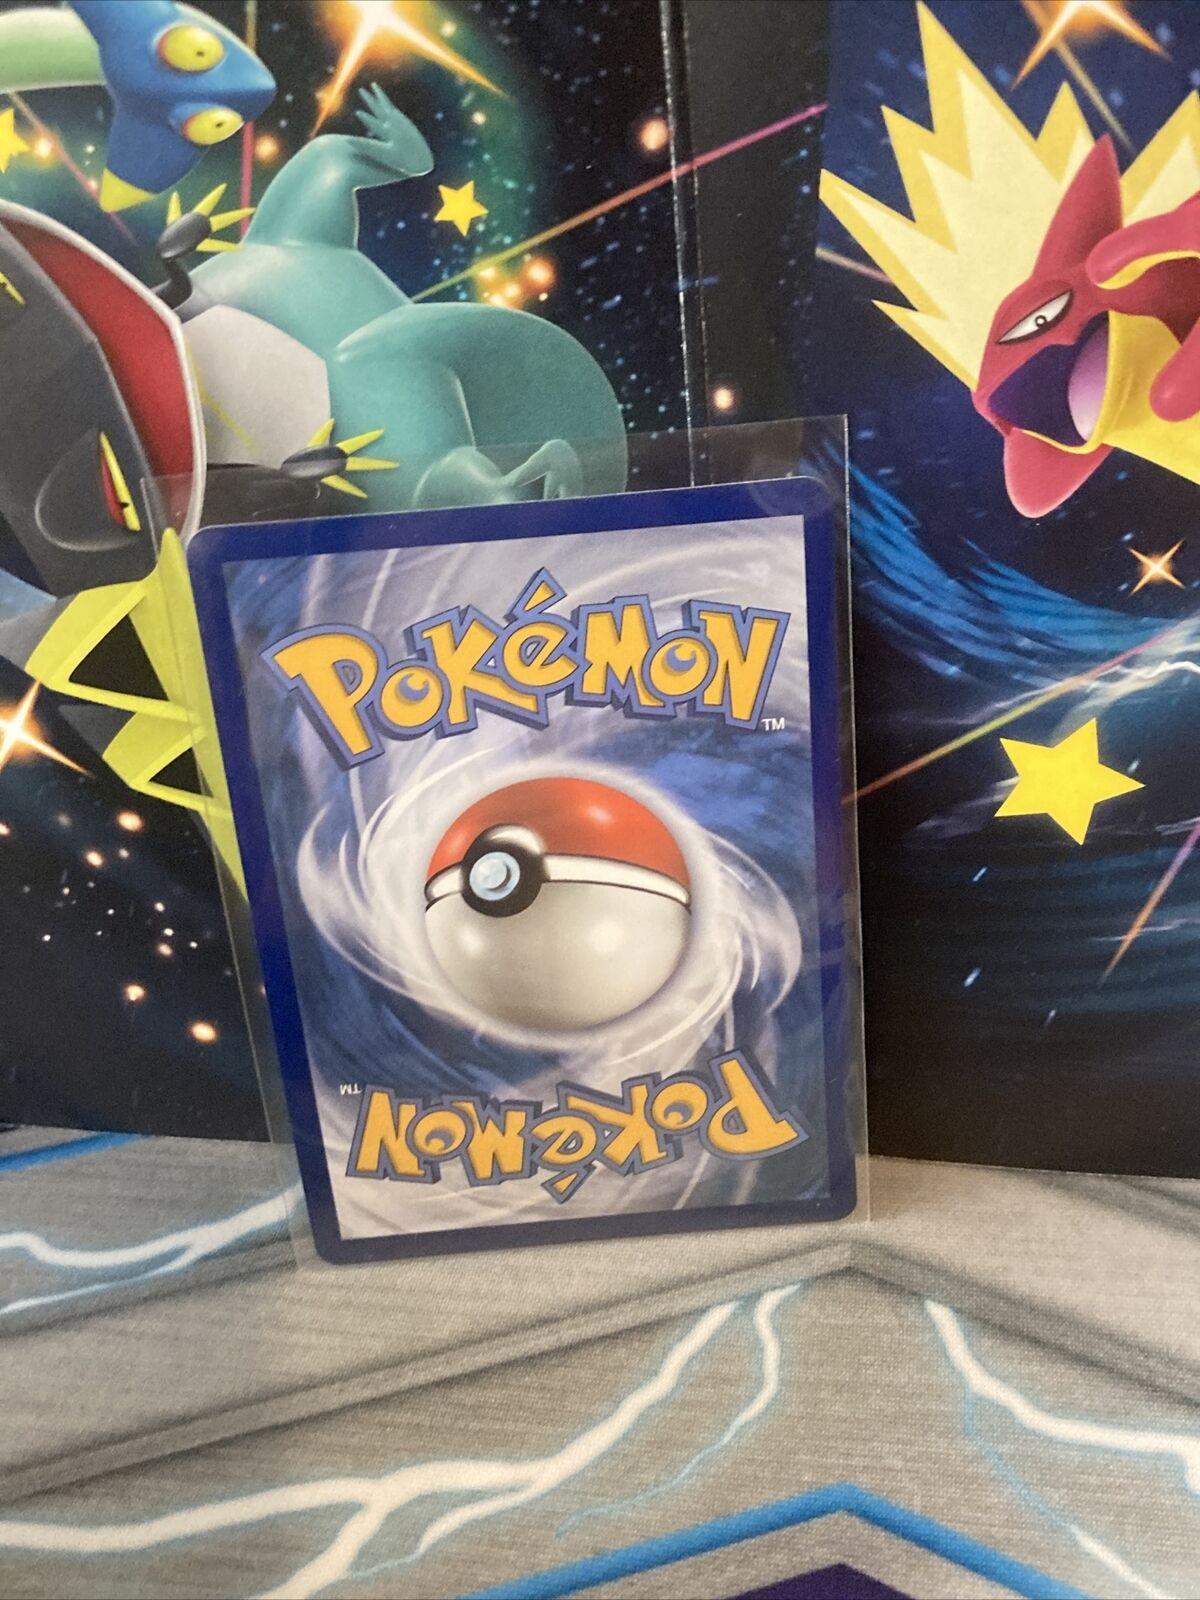 Pokémon TCG BLAZIKEN VMAX 021/198 CHILLING REIGN FRESH PULL! - Image 3